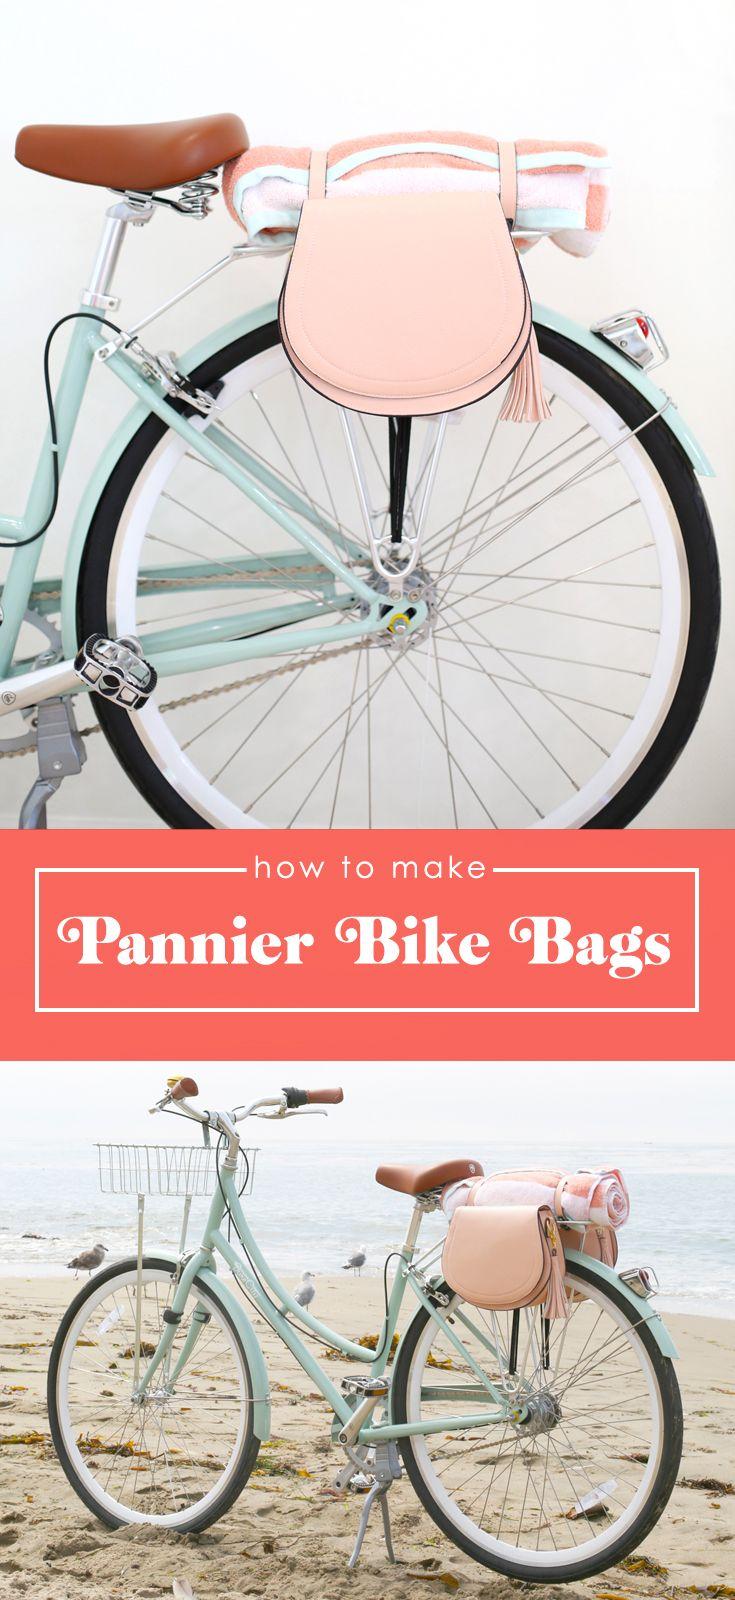 How to make DIY Pannier Bike Bags.